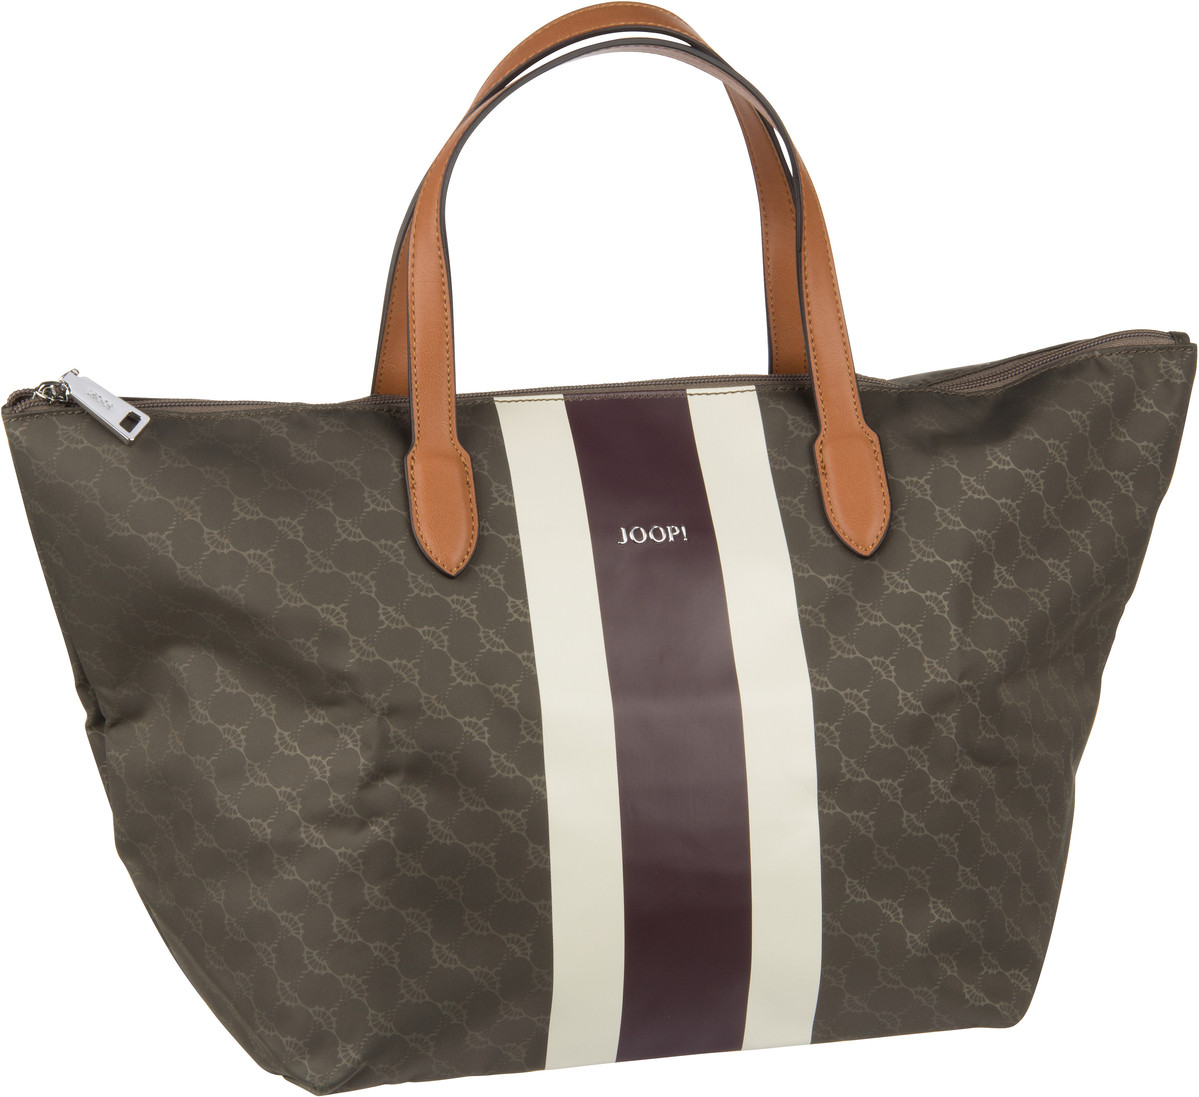 Shopper Piccolina Due Helena HandBag LHZ Khaki